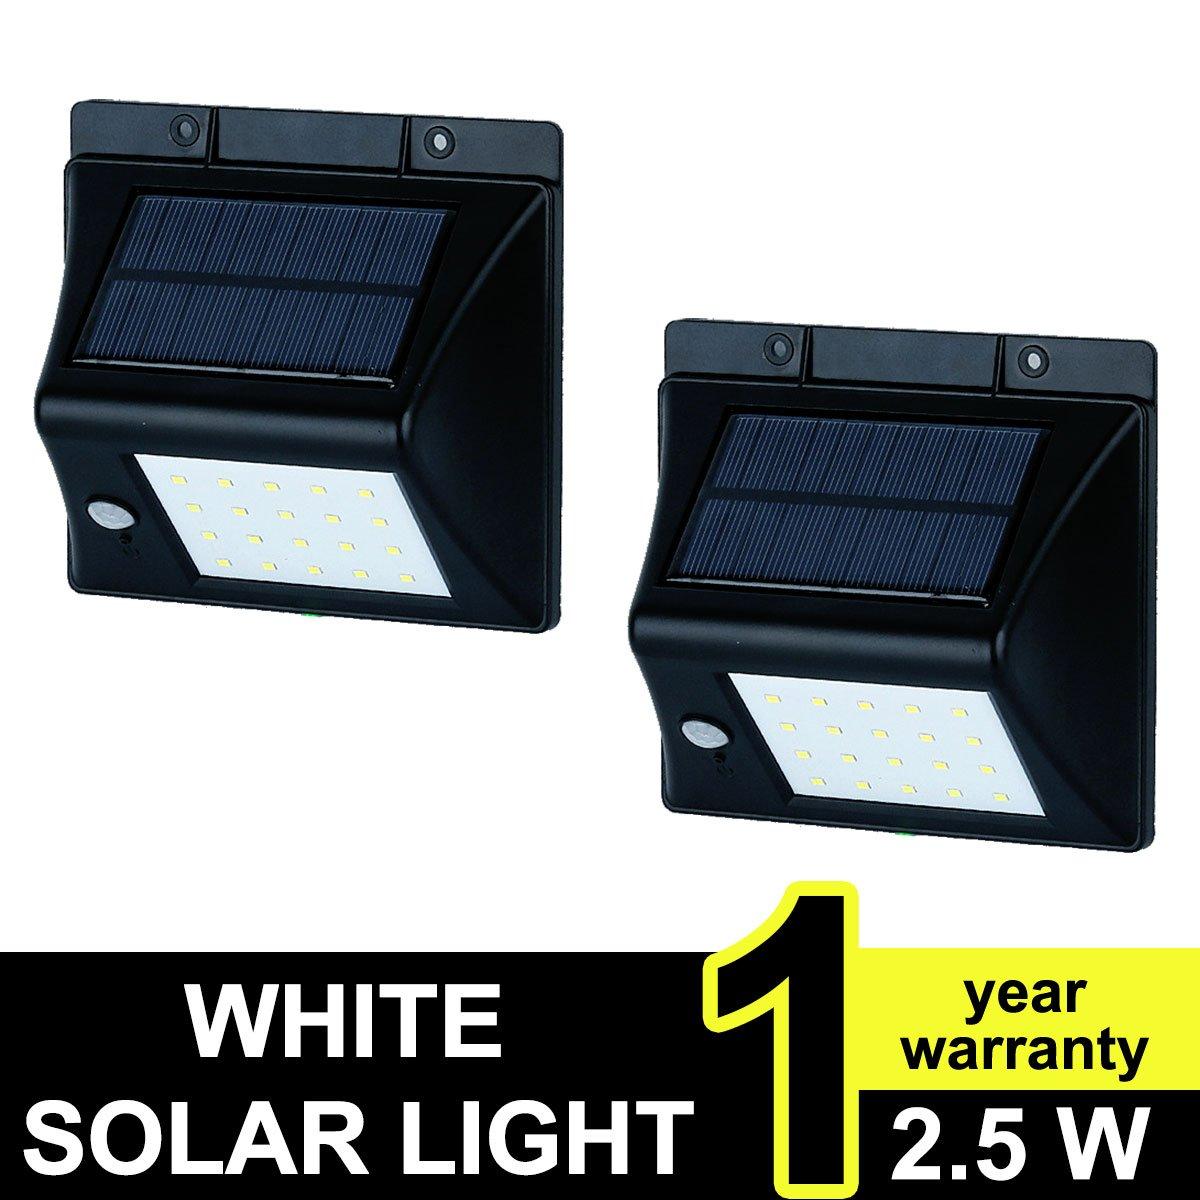 20 LEDソーラーライト、ソーラーエネルギーと人体誘導耐候セキュリティライトモーションセンサーランプ、ガーデン、アウトドア、フェンス、パティオ、デッキ、庭、ホーム、私道、階段、外ウォールなど。 5000100 B06XDSJT6W 2X 2X